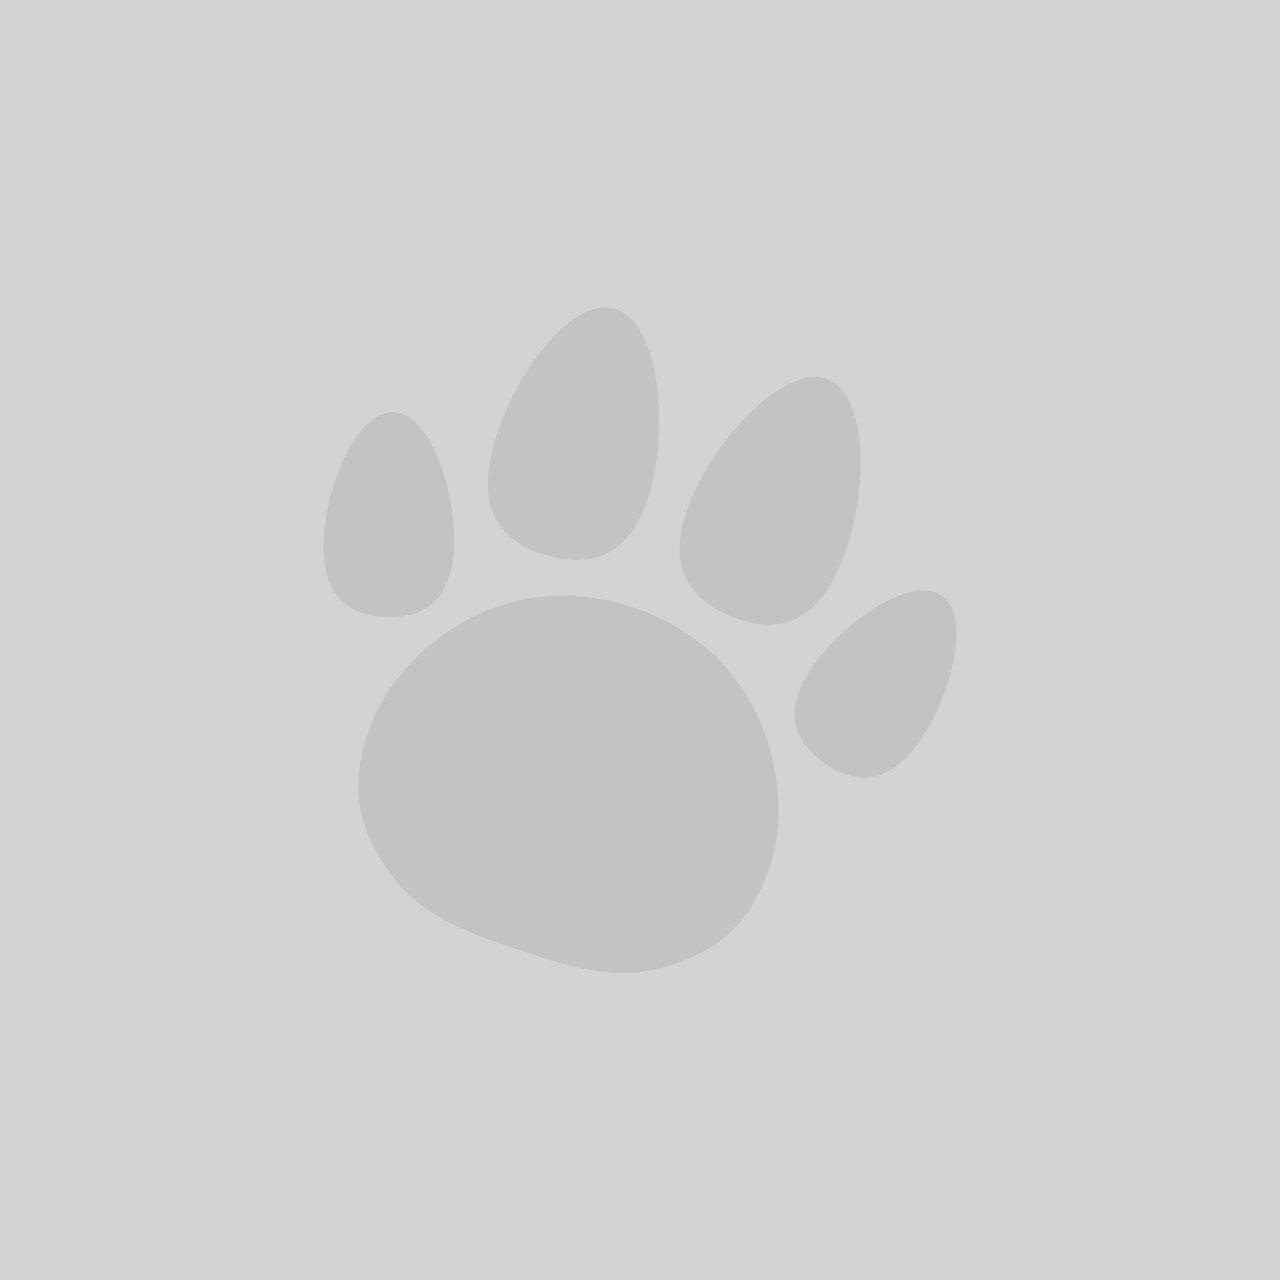 Ezydog Neo Dog Collar Chocolate Brown (Size Options)